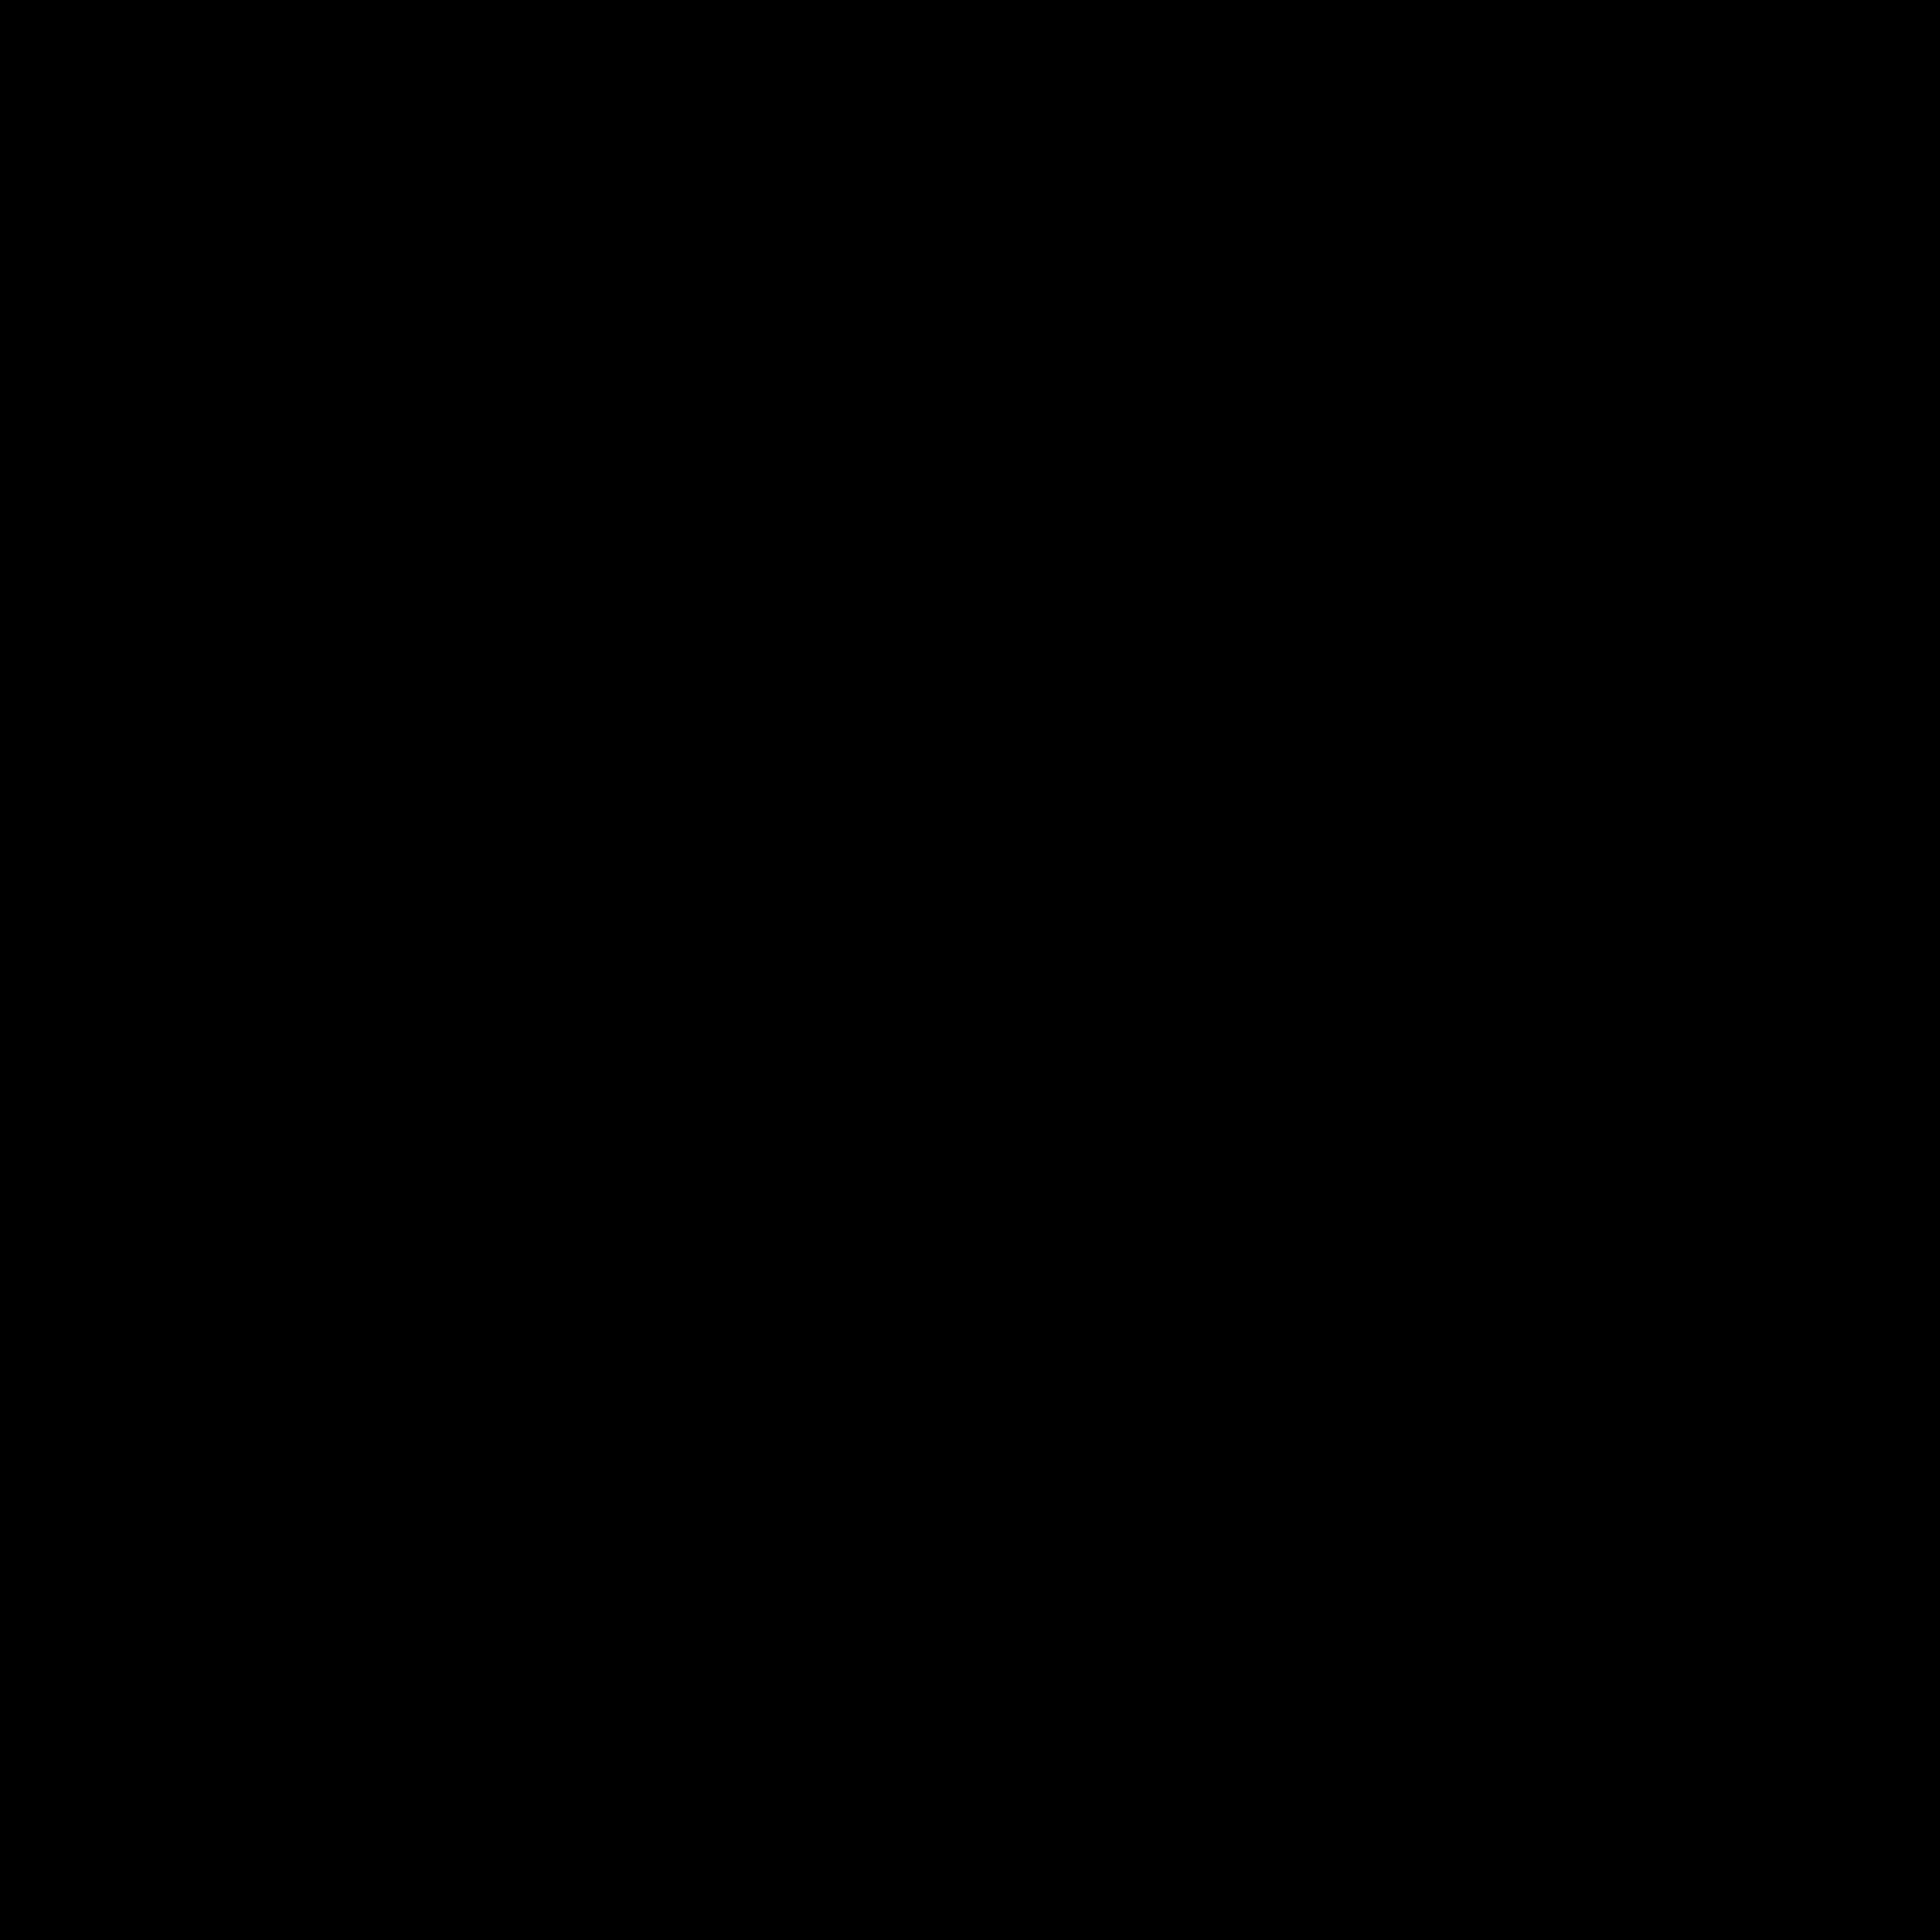 lancome-2-logo-png-transparent.png